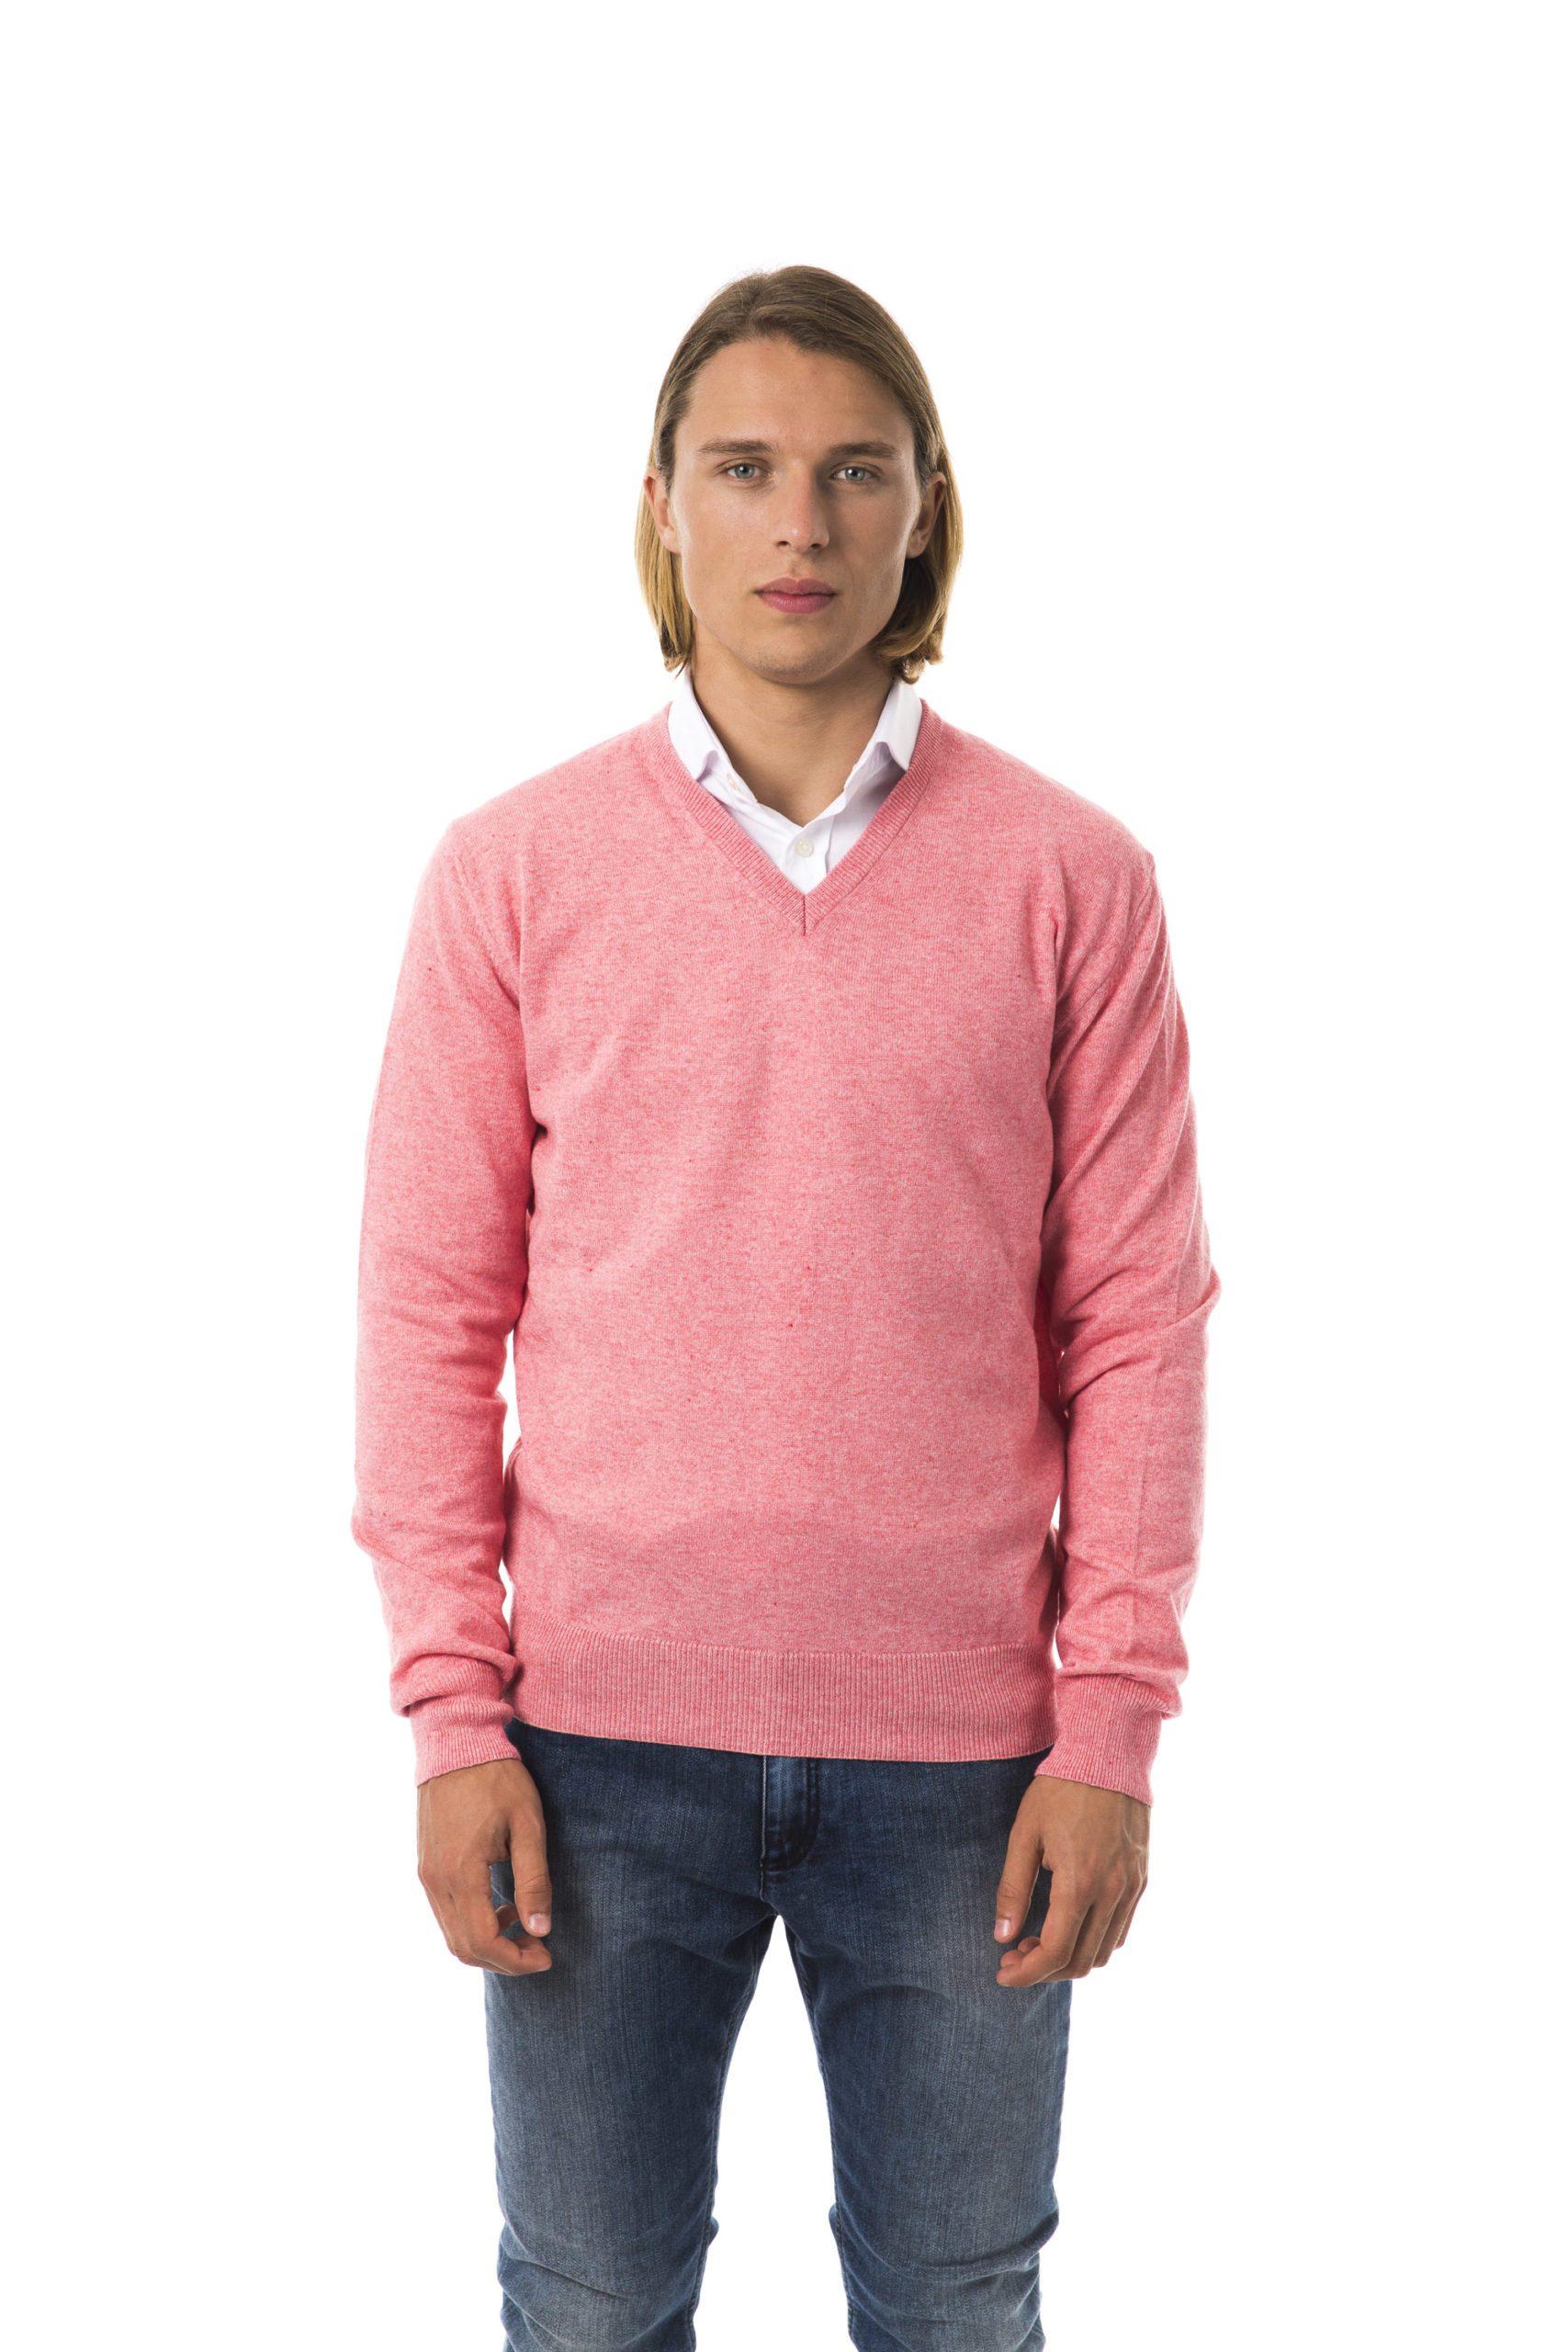 Uominitaliani Men's Corallo Sweater Pink UO817217 - M